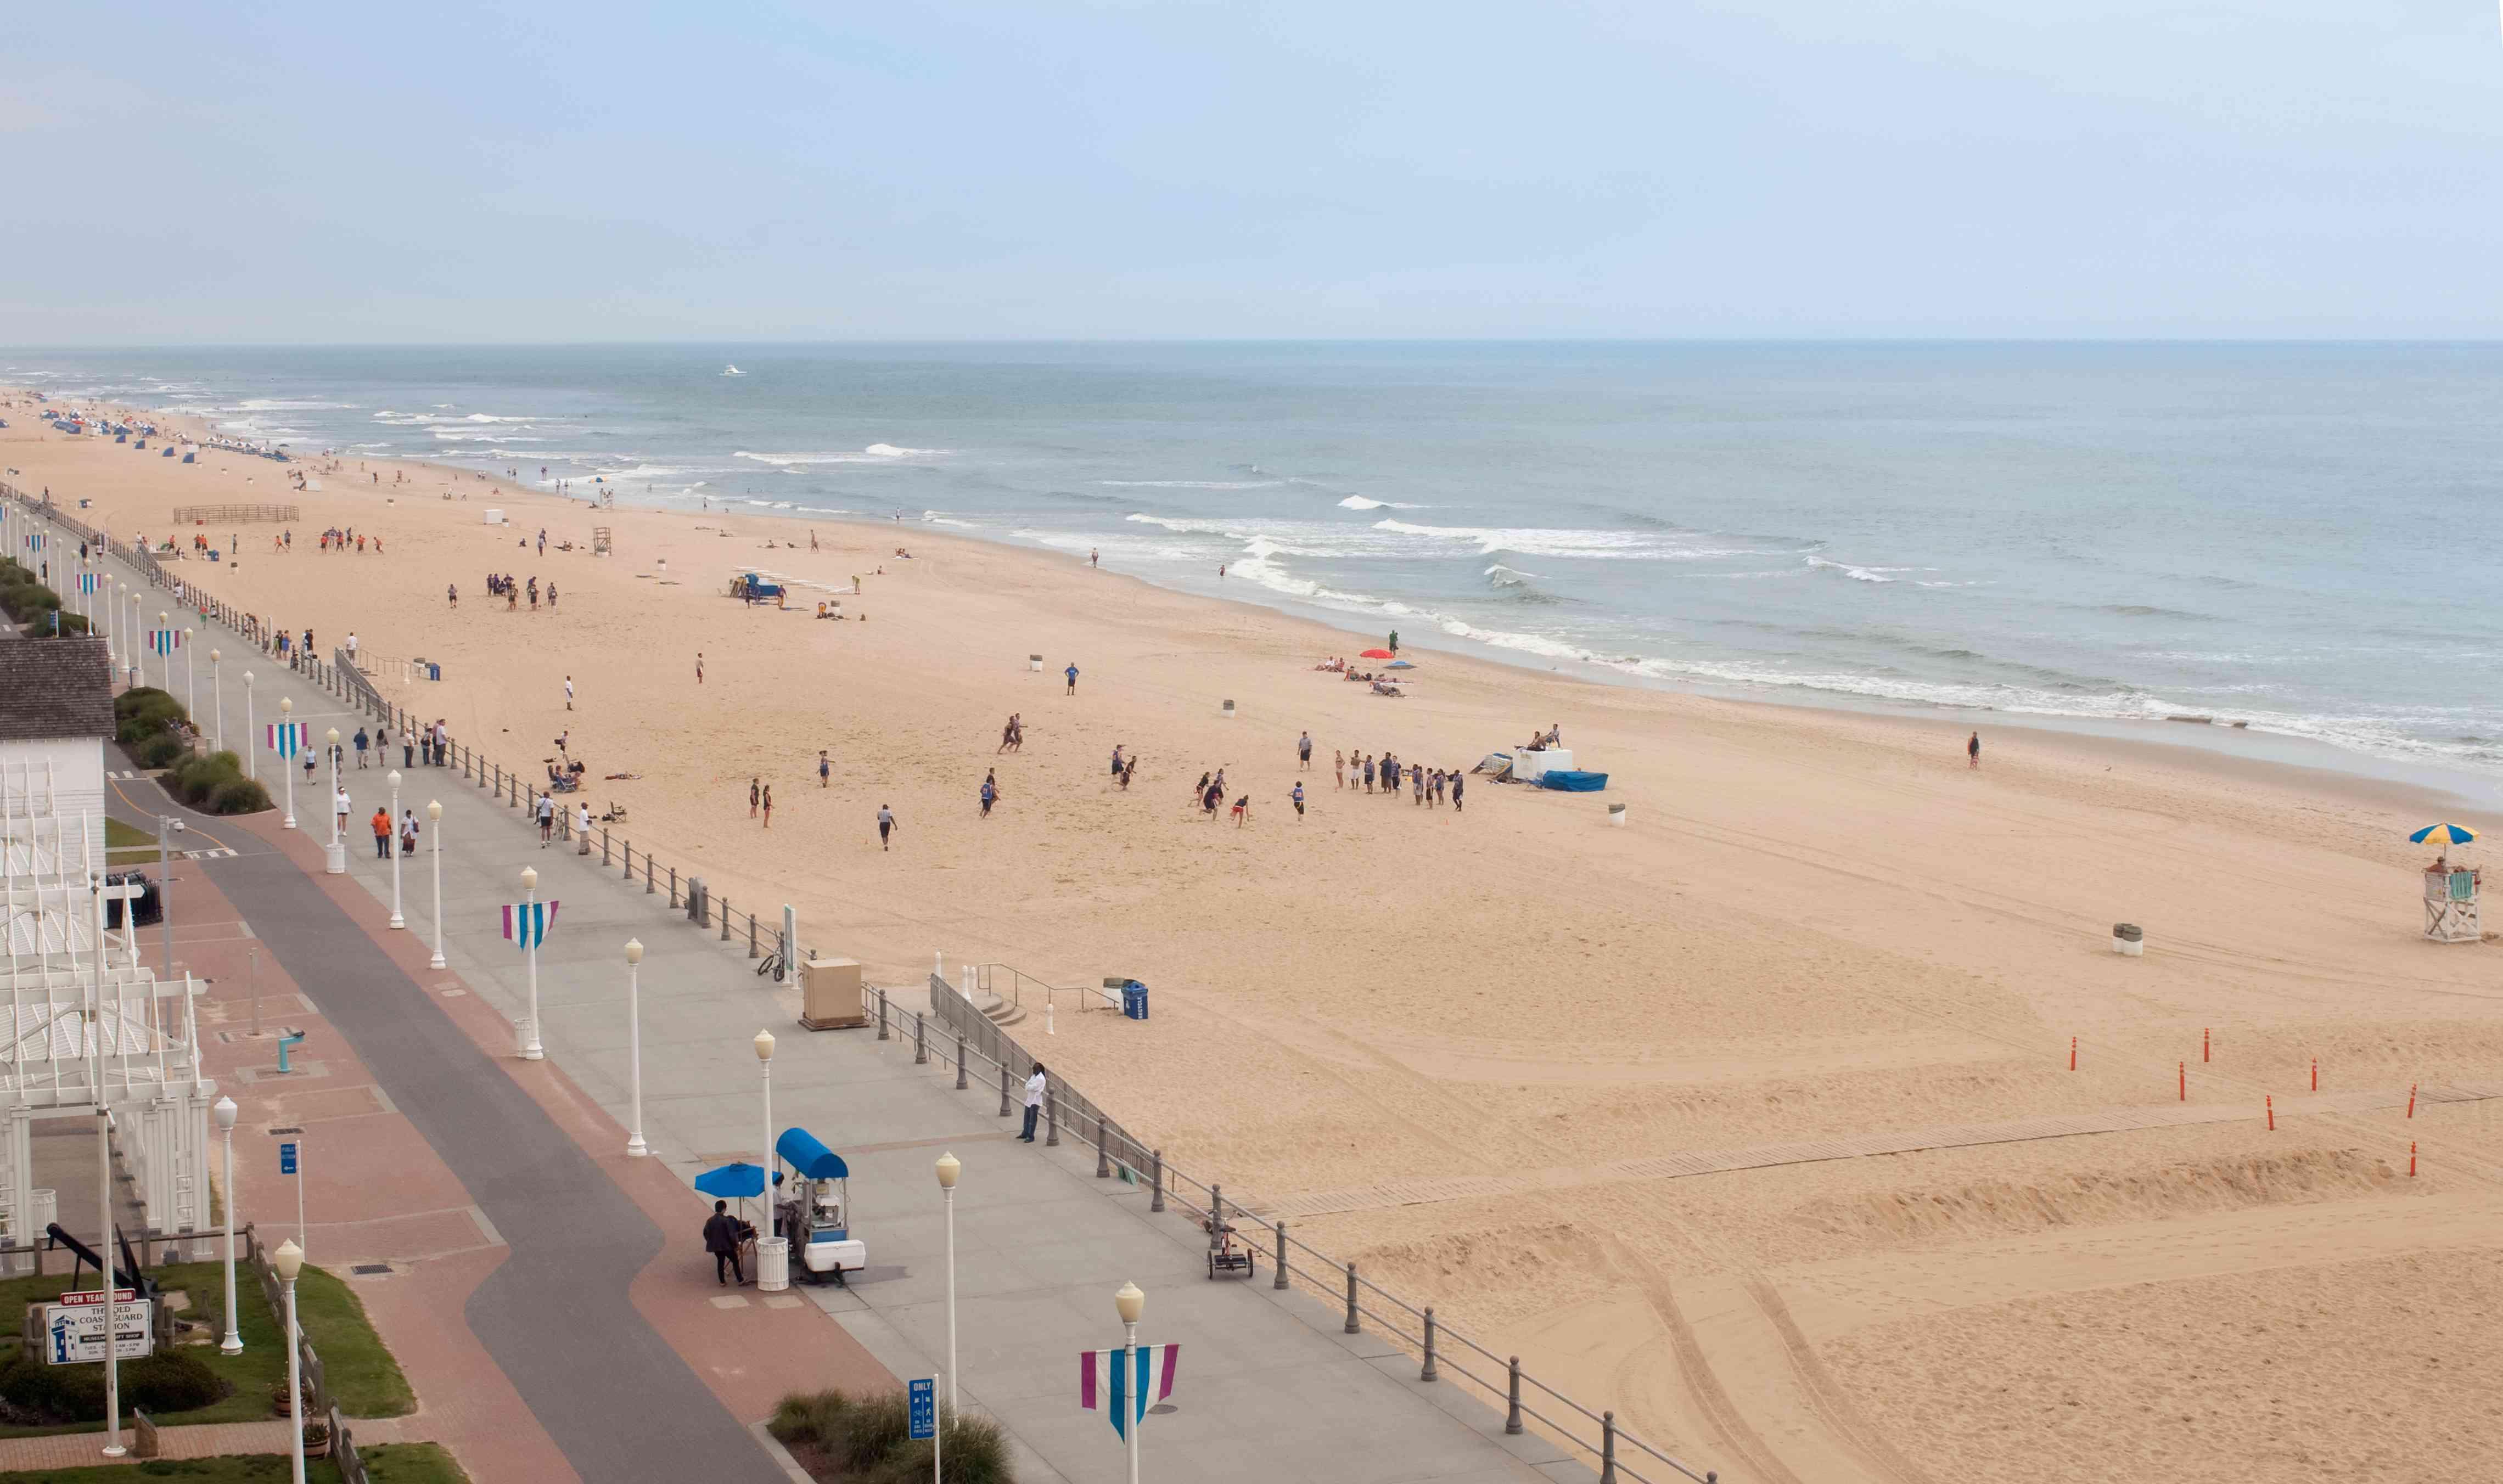 Boardwalk at Virginia Beach